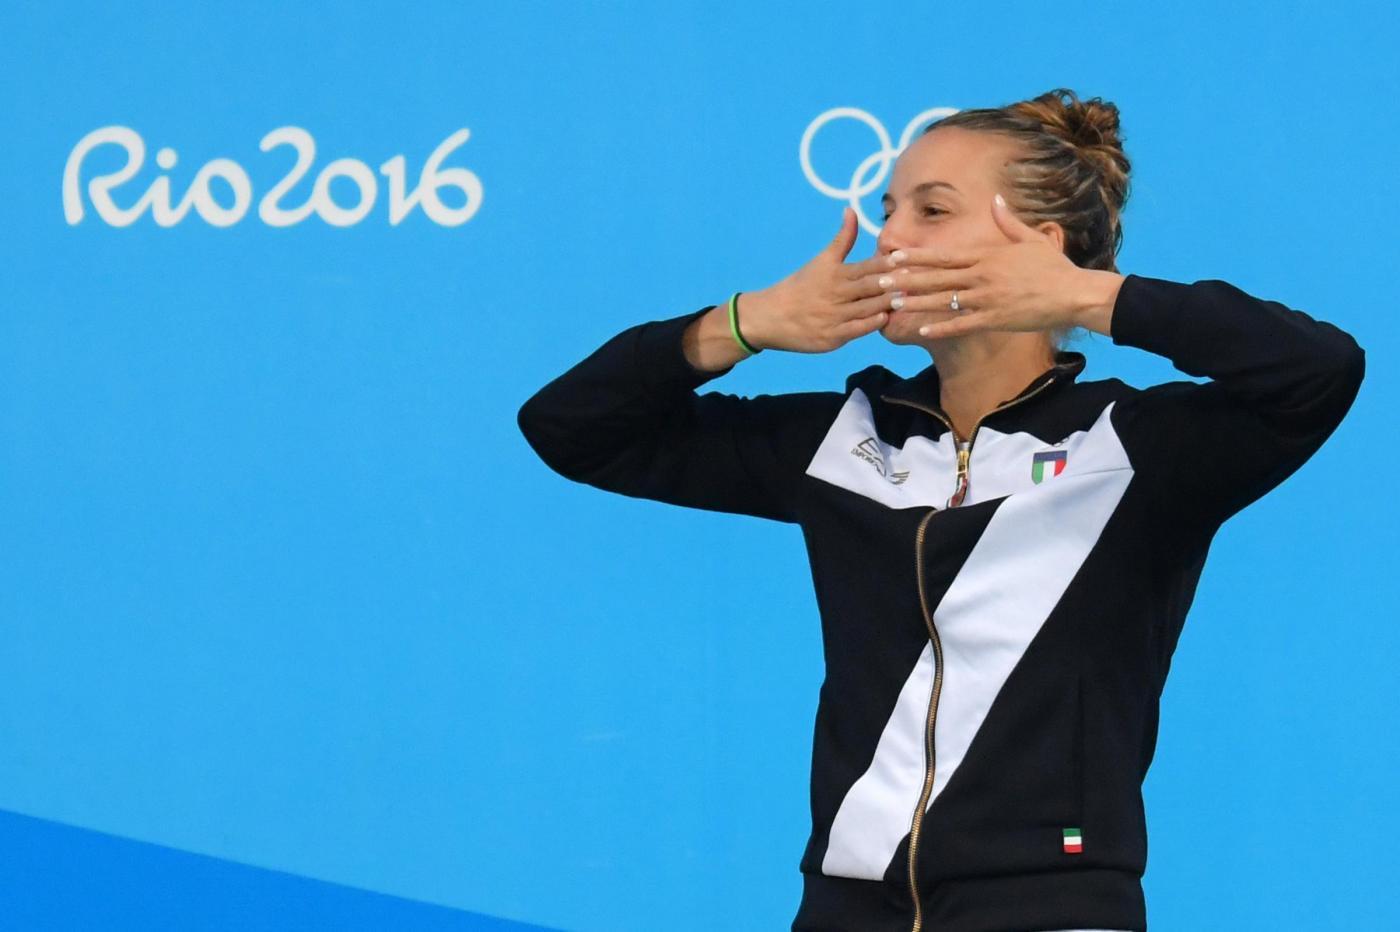 Olimpiadi 2016: Tania Cagnotto leggendaria, bronzo dai 3 metri